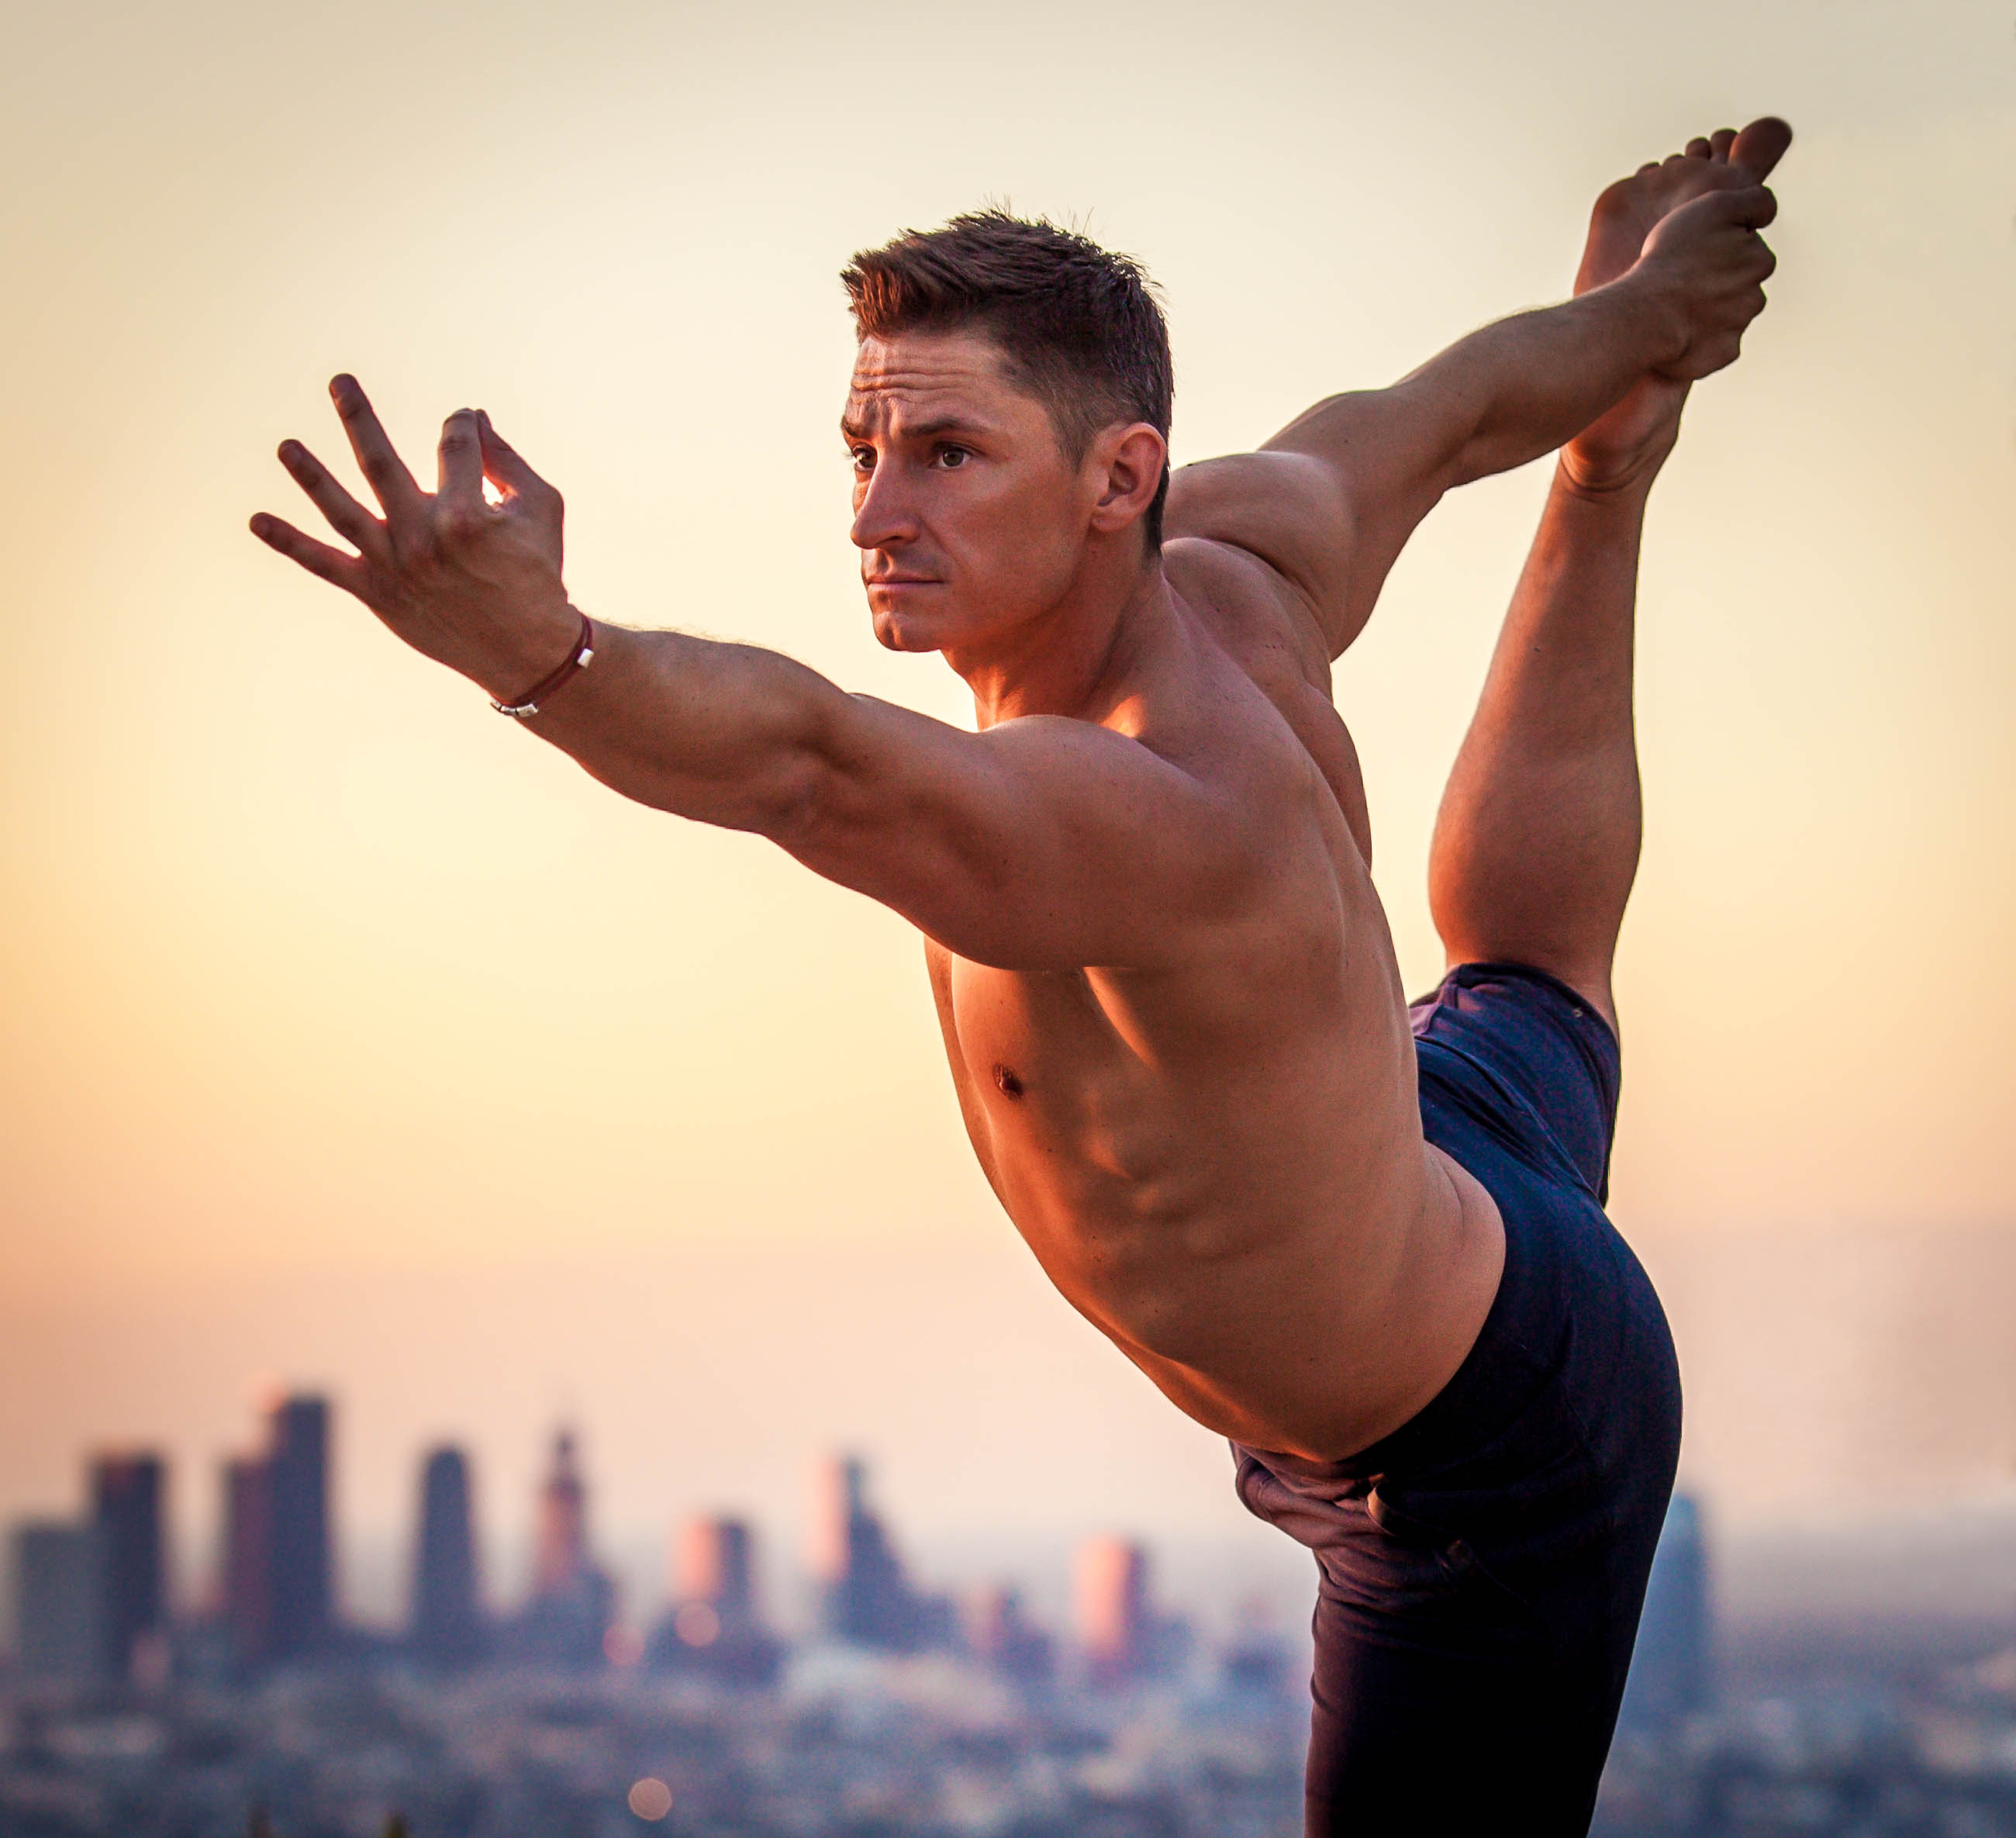 yoga athlete fitness jake ferree